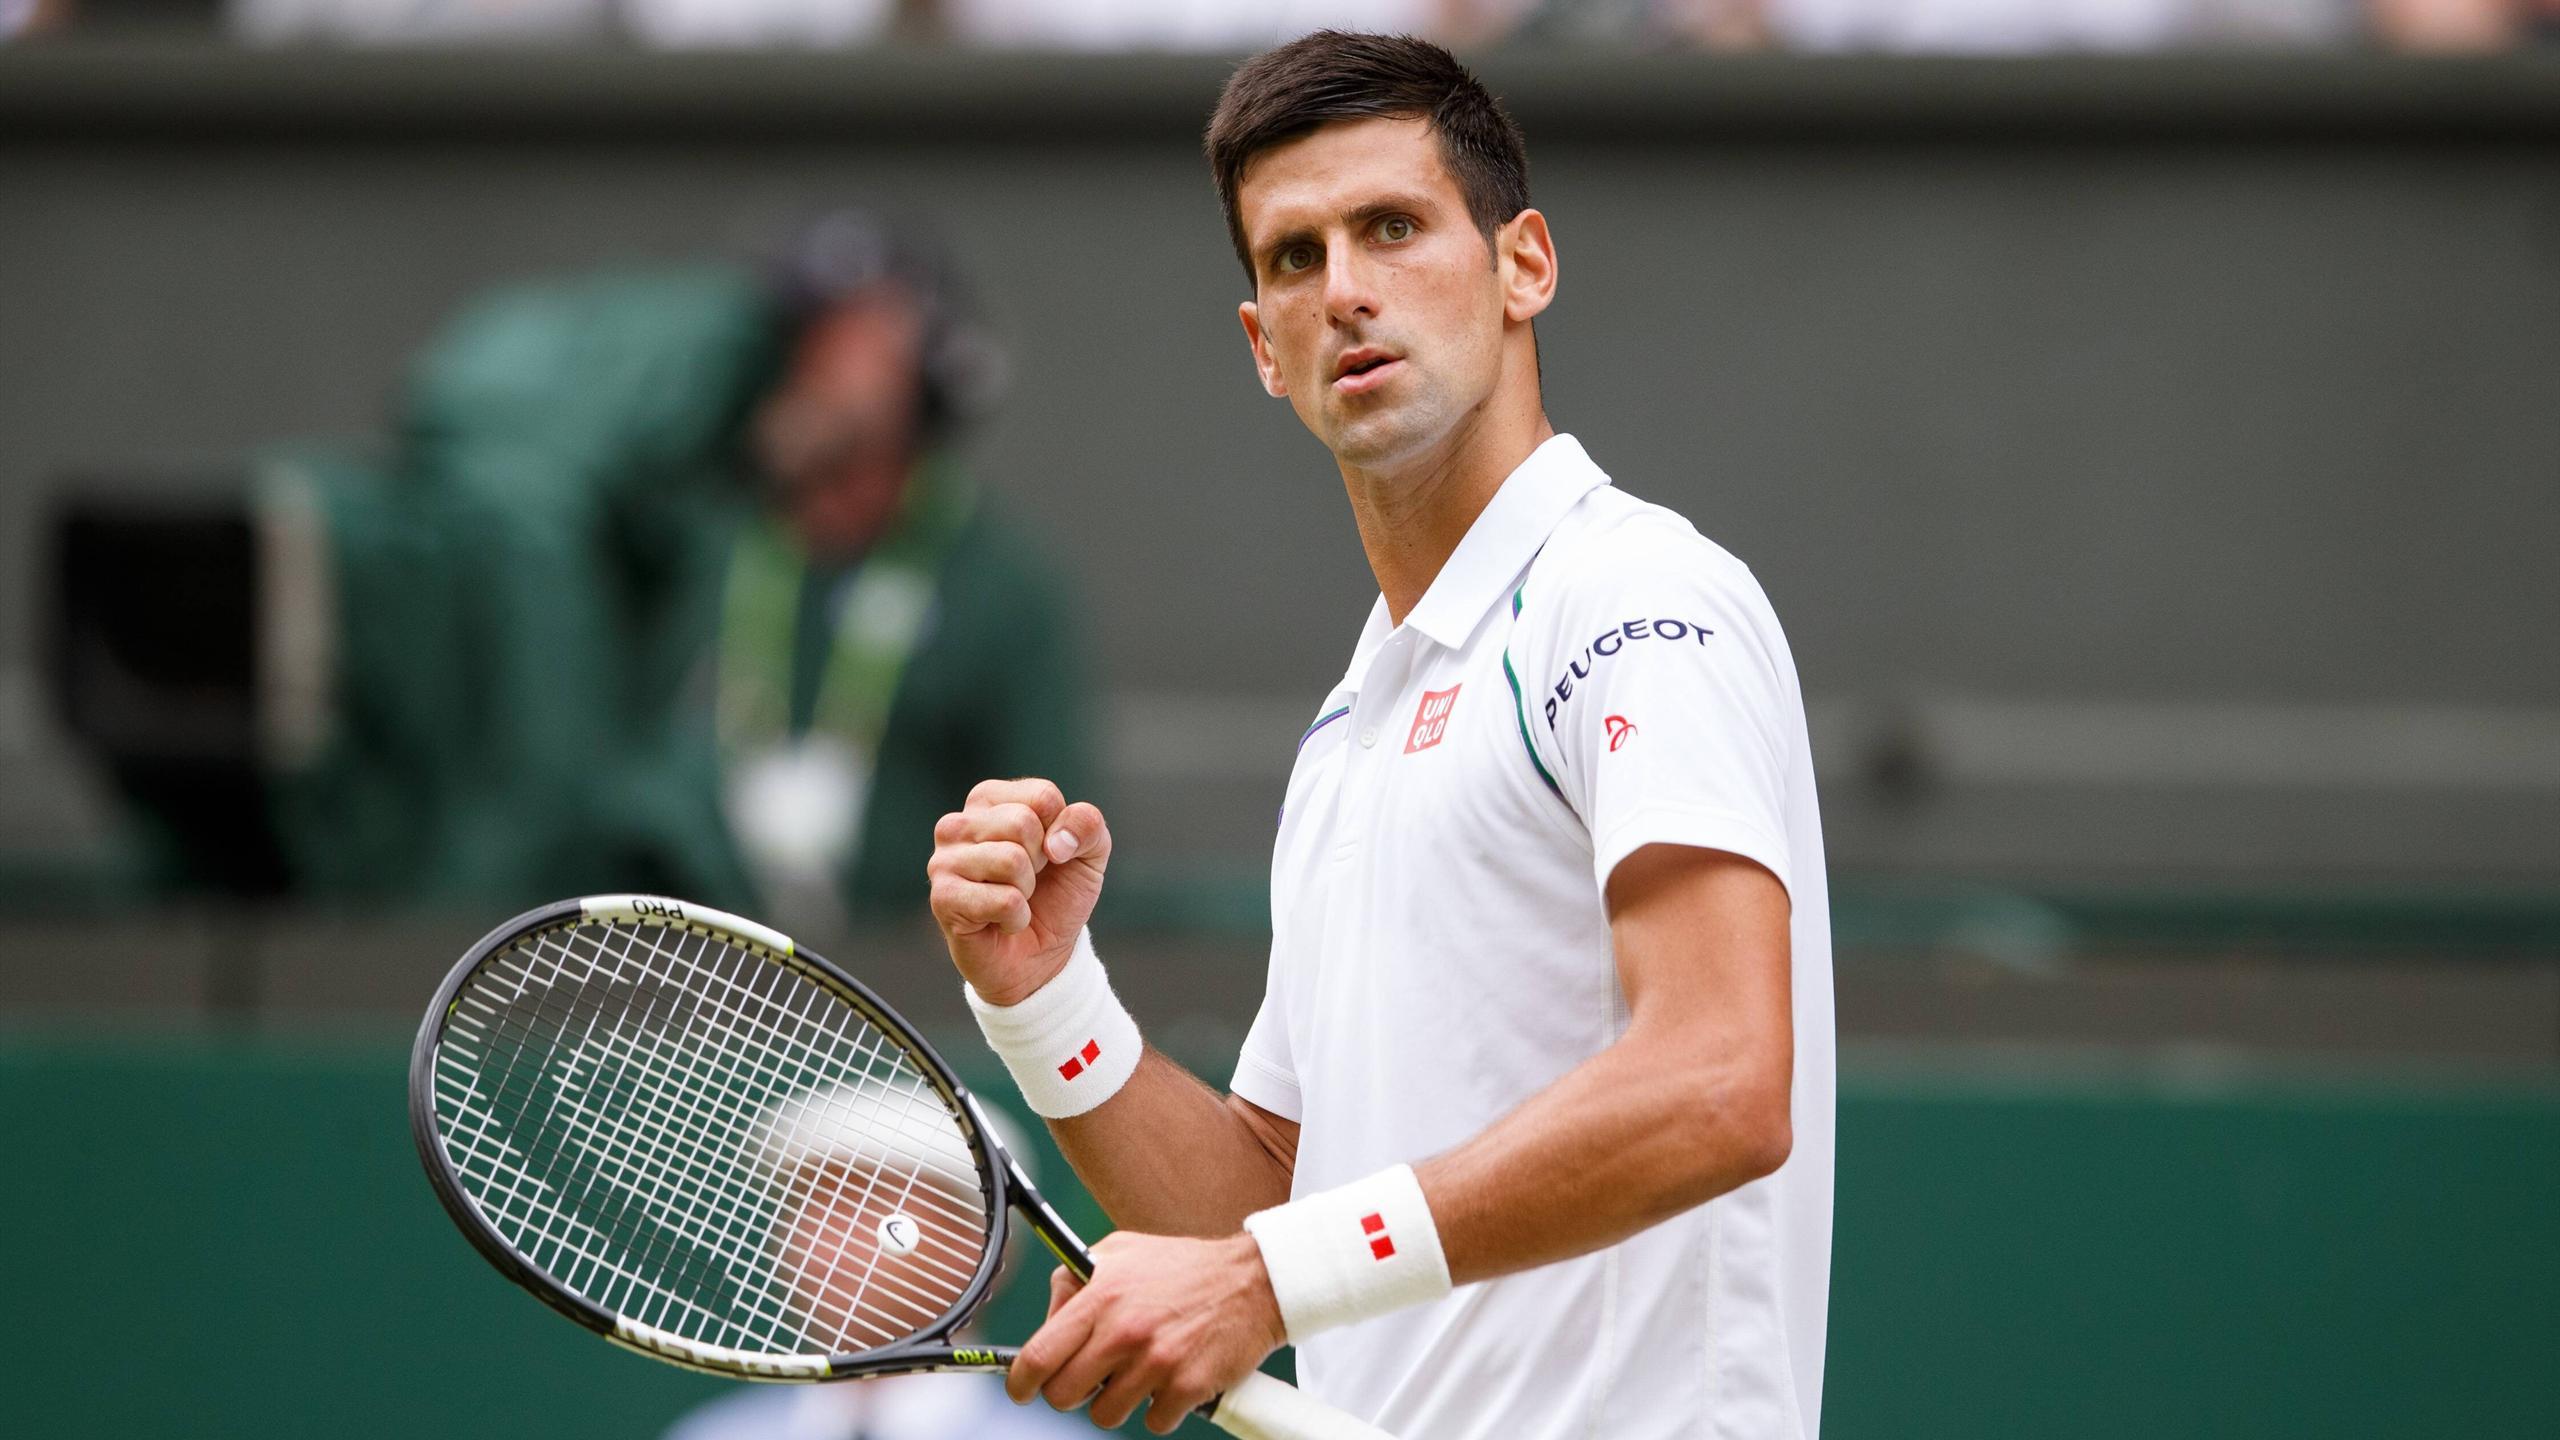 Wimbledon defending champion Novak Djokovic